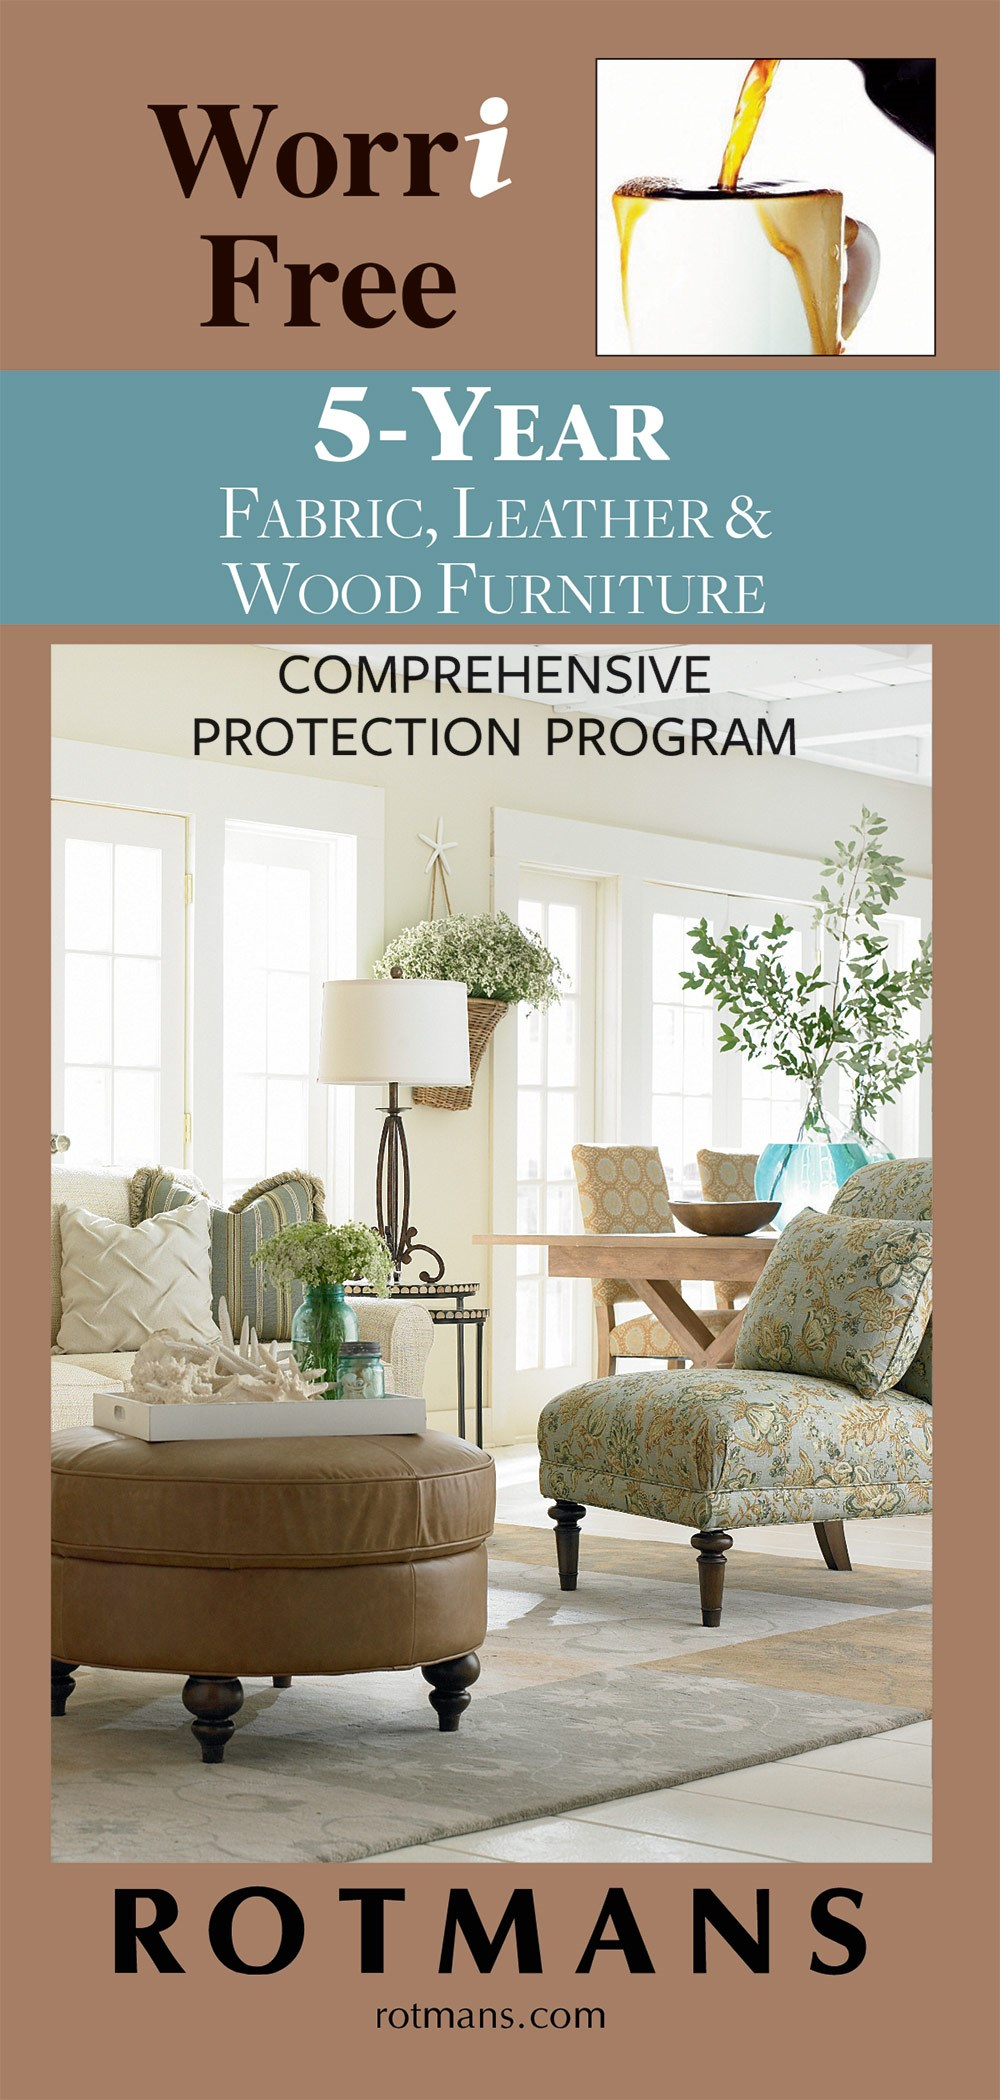 Worri Free Protection Plan Info 1